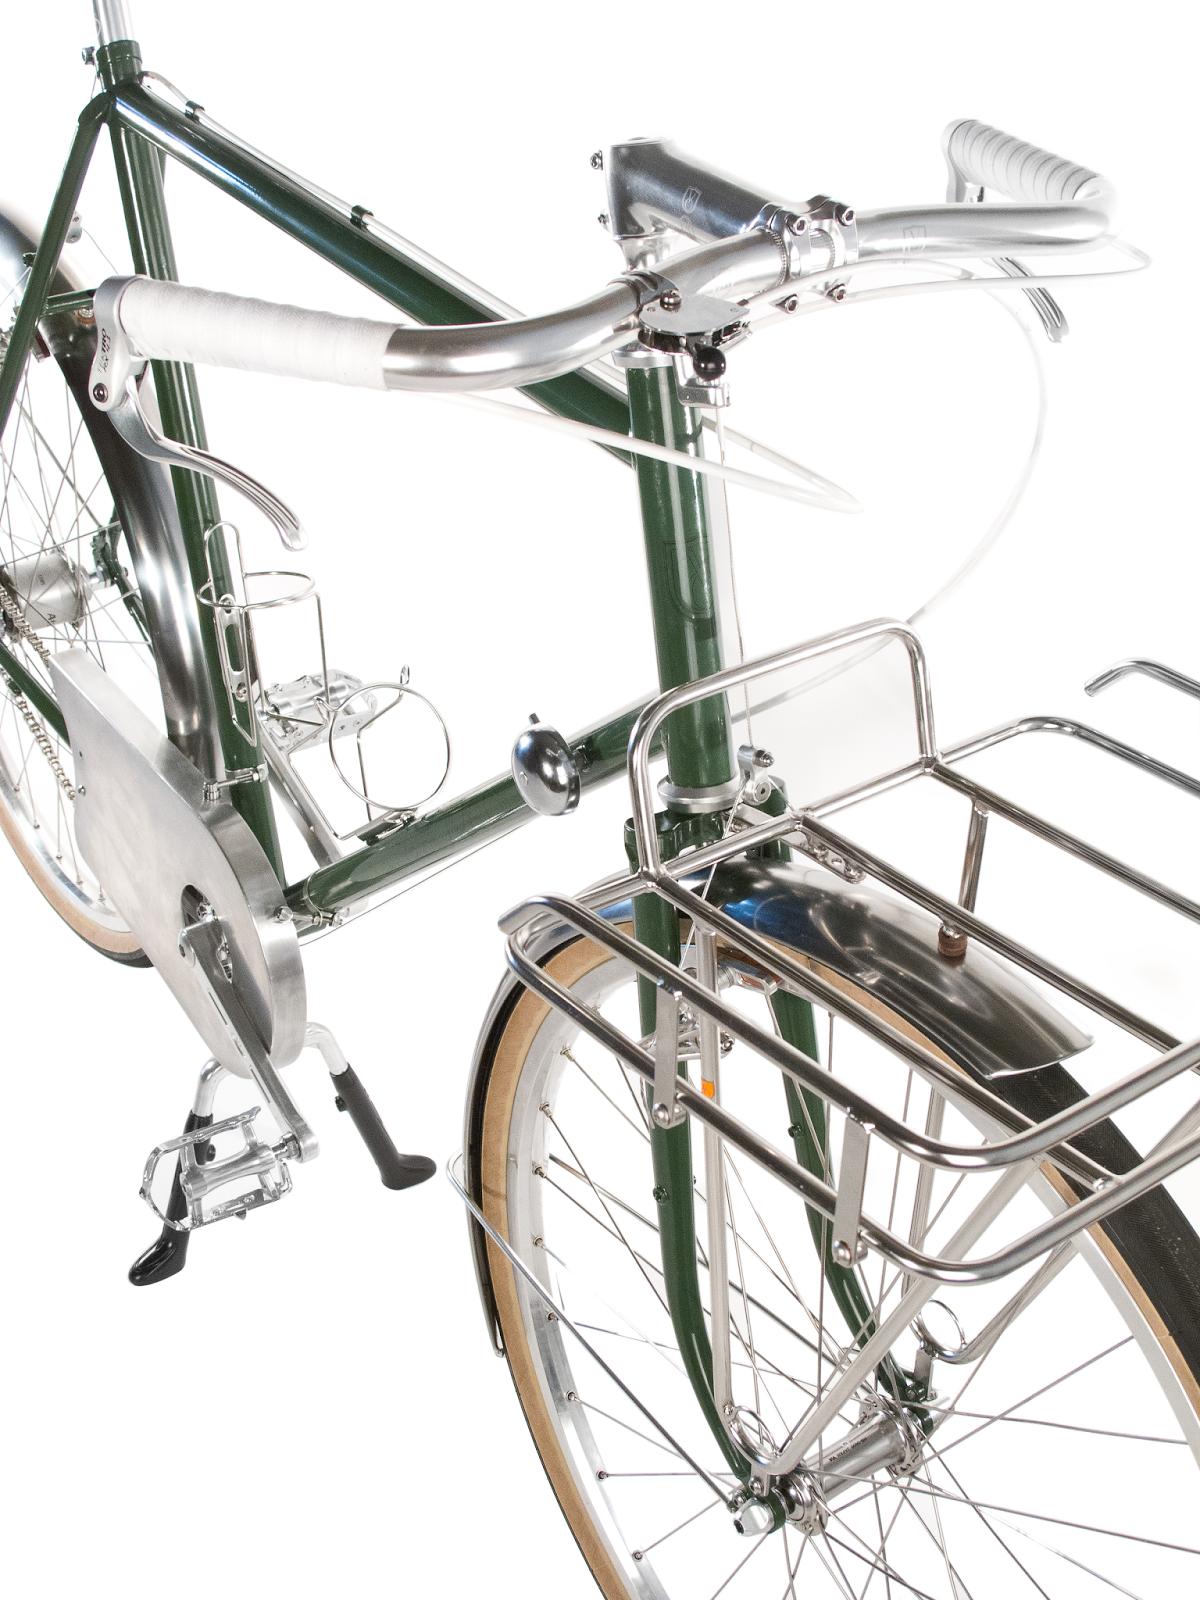 handlebar bike upright flat porteur compe dia selection velo orange shifter frame building bar boss brake